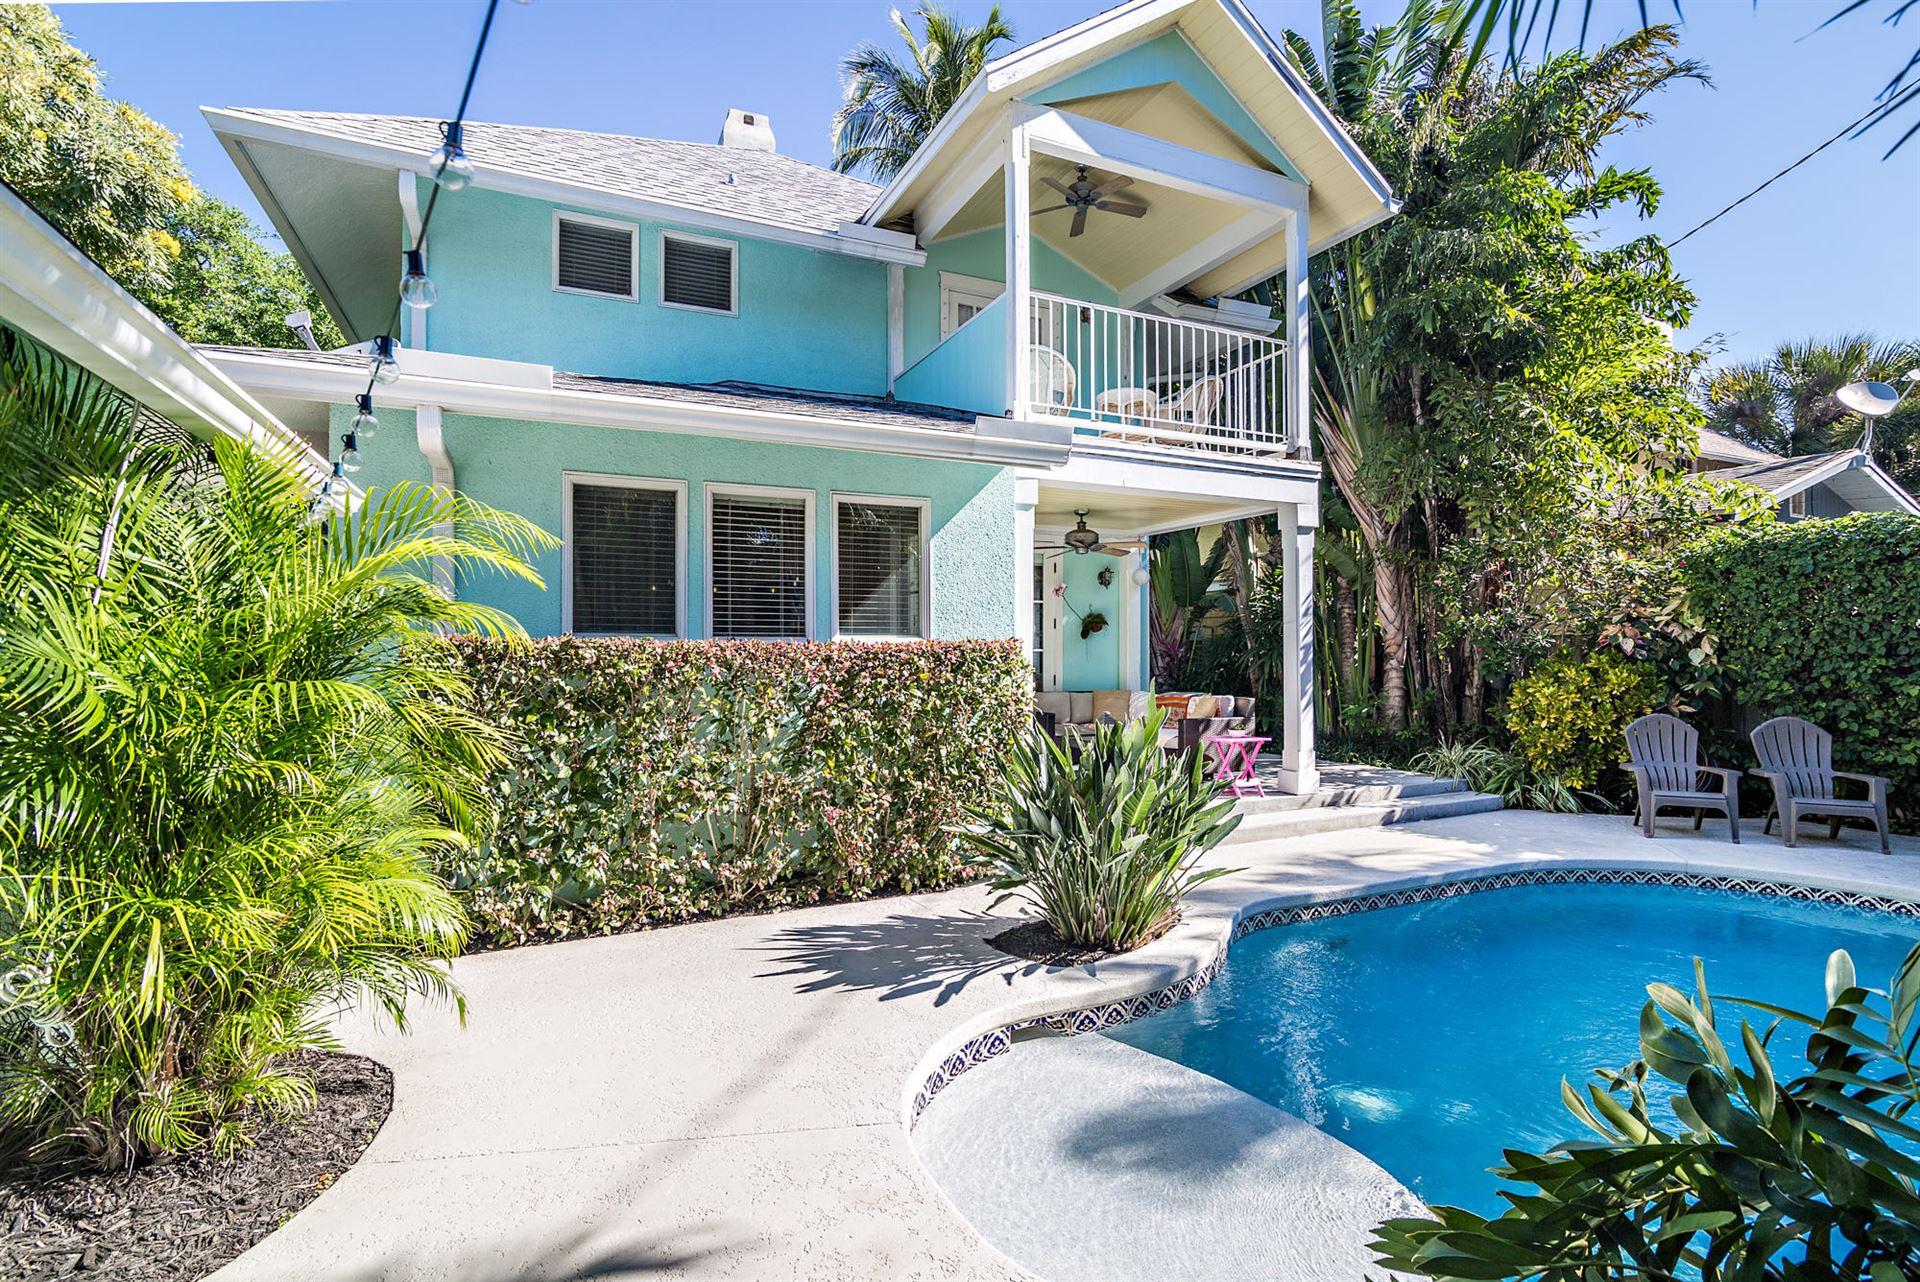 324 Croton, West Palm Beach, 33401 Photo 1